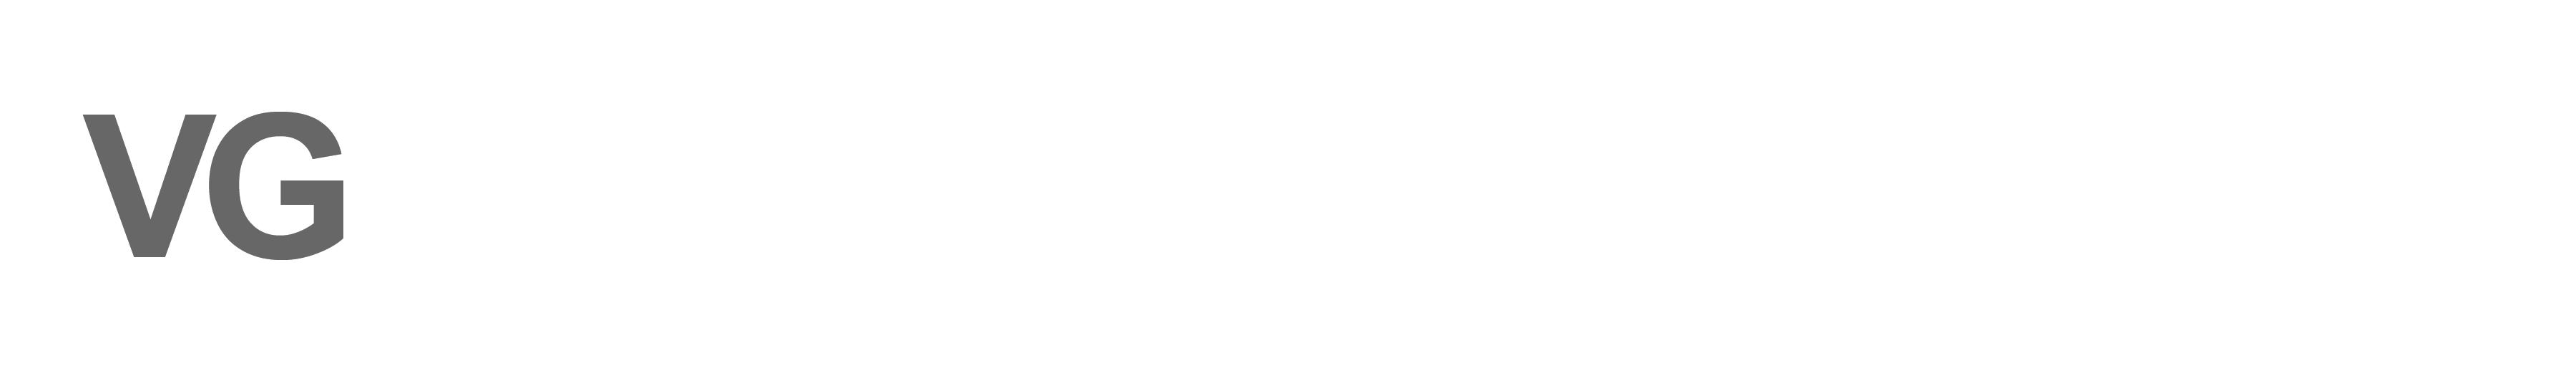 Verdical Group Lockup Logo